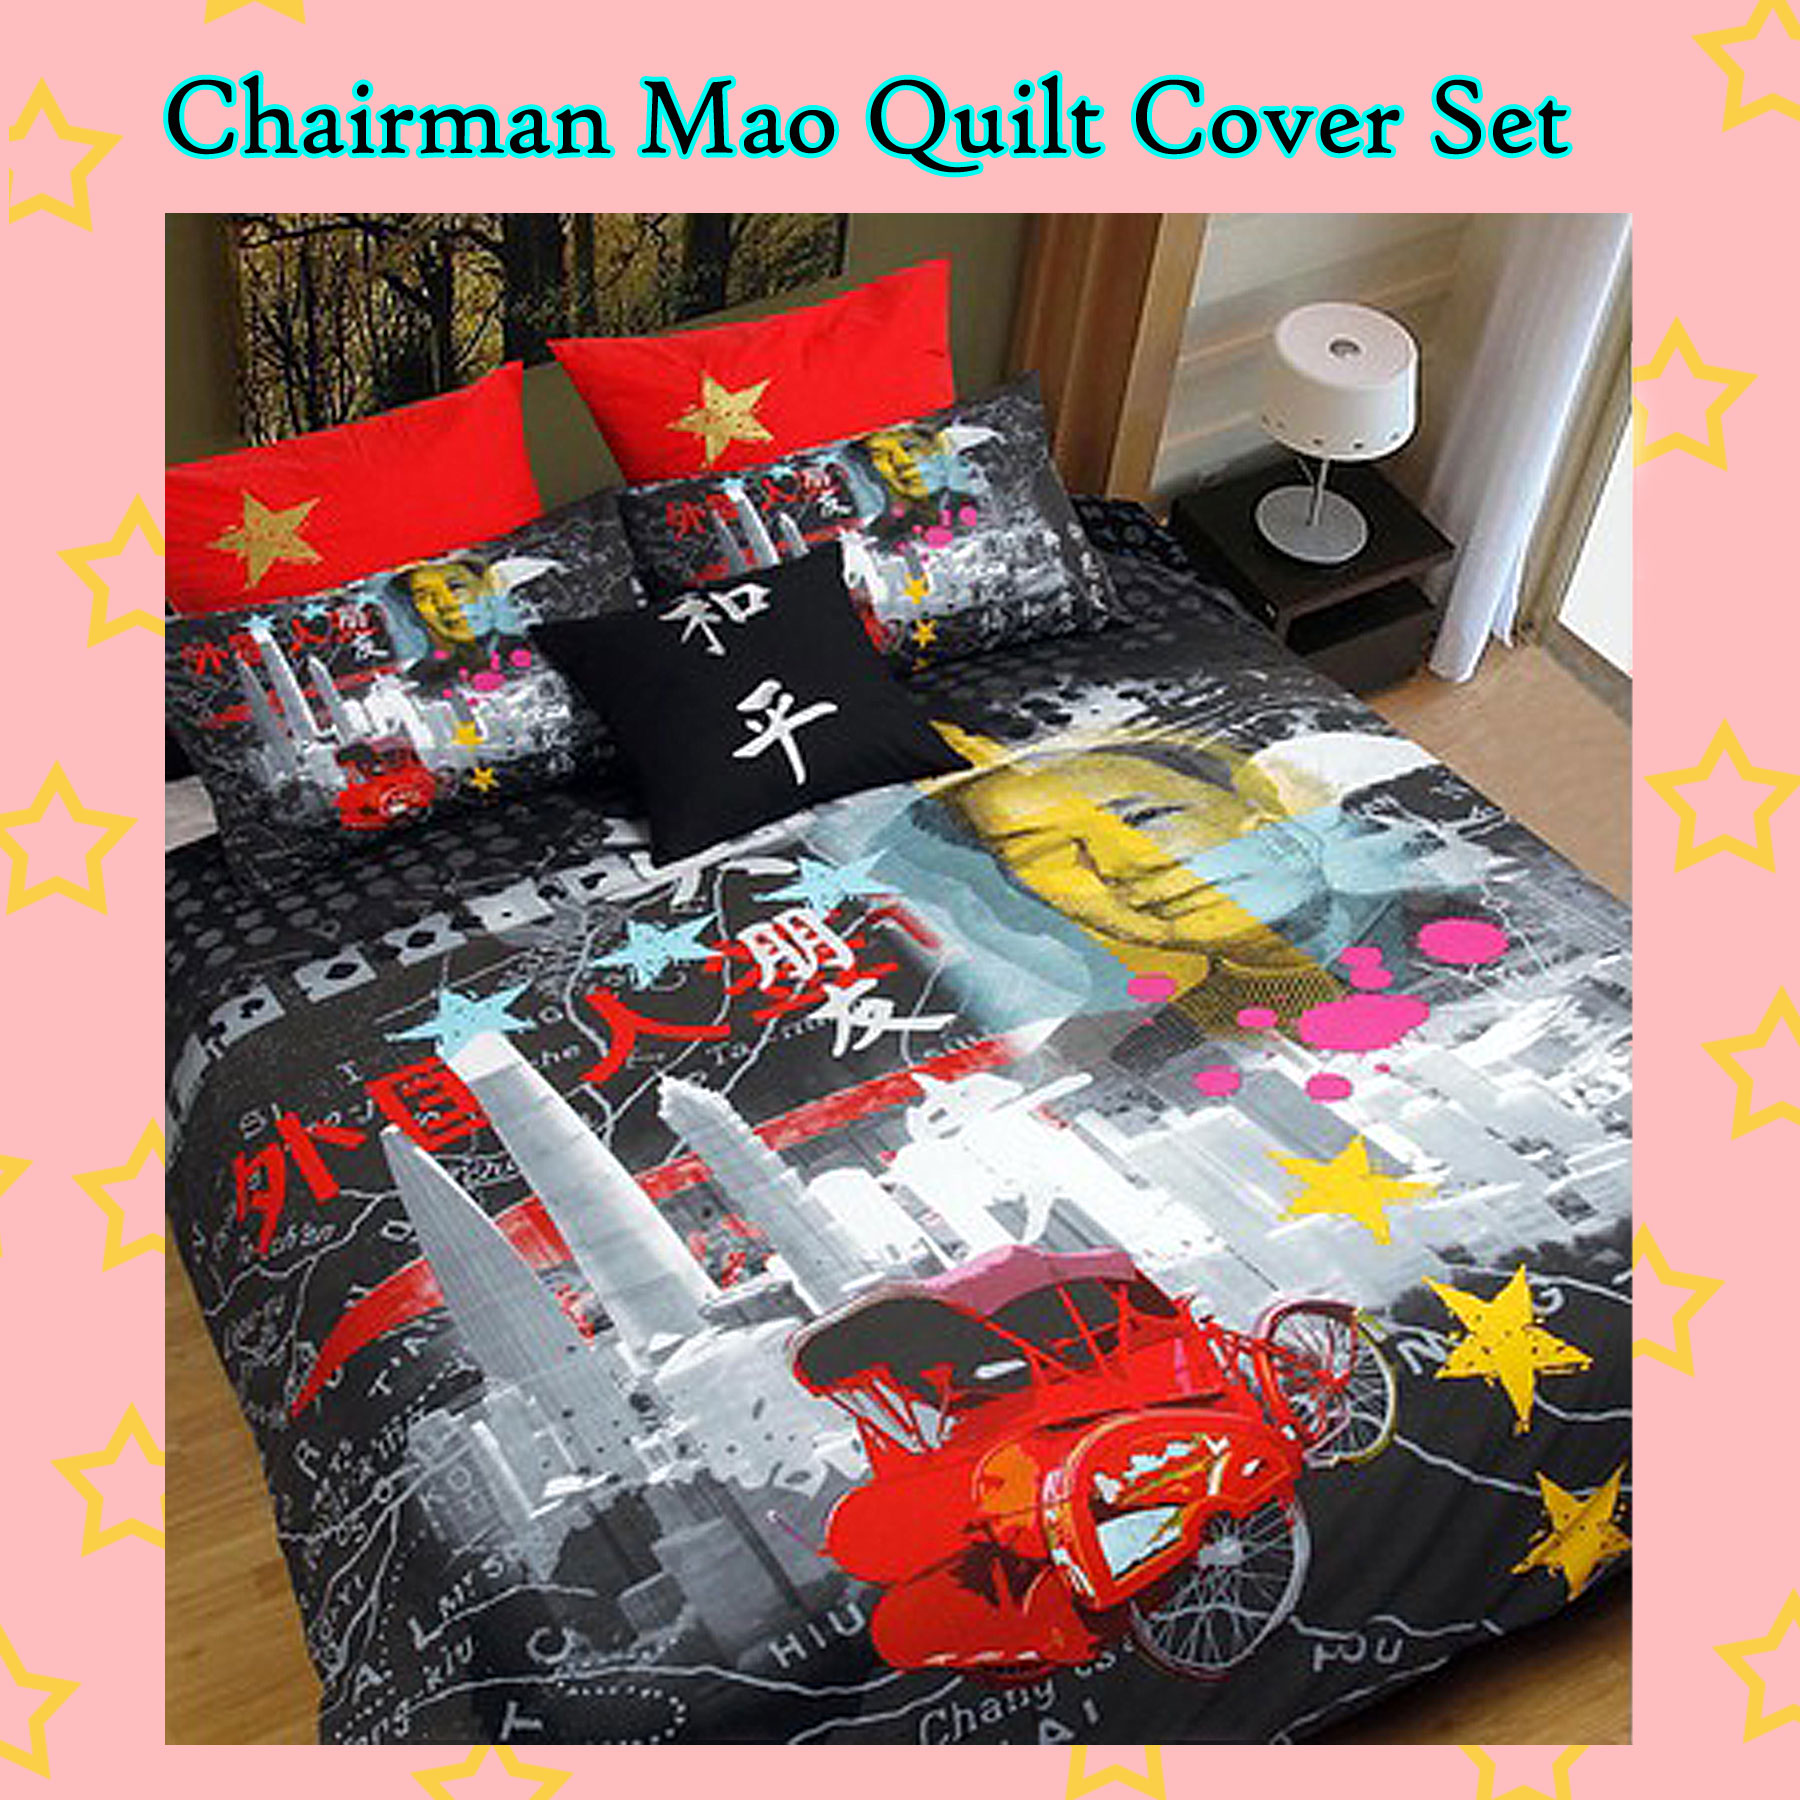 SINGLE DOUBLE QUEEN KING China Chairman Mao Quilt Doona Duvet Cover Set